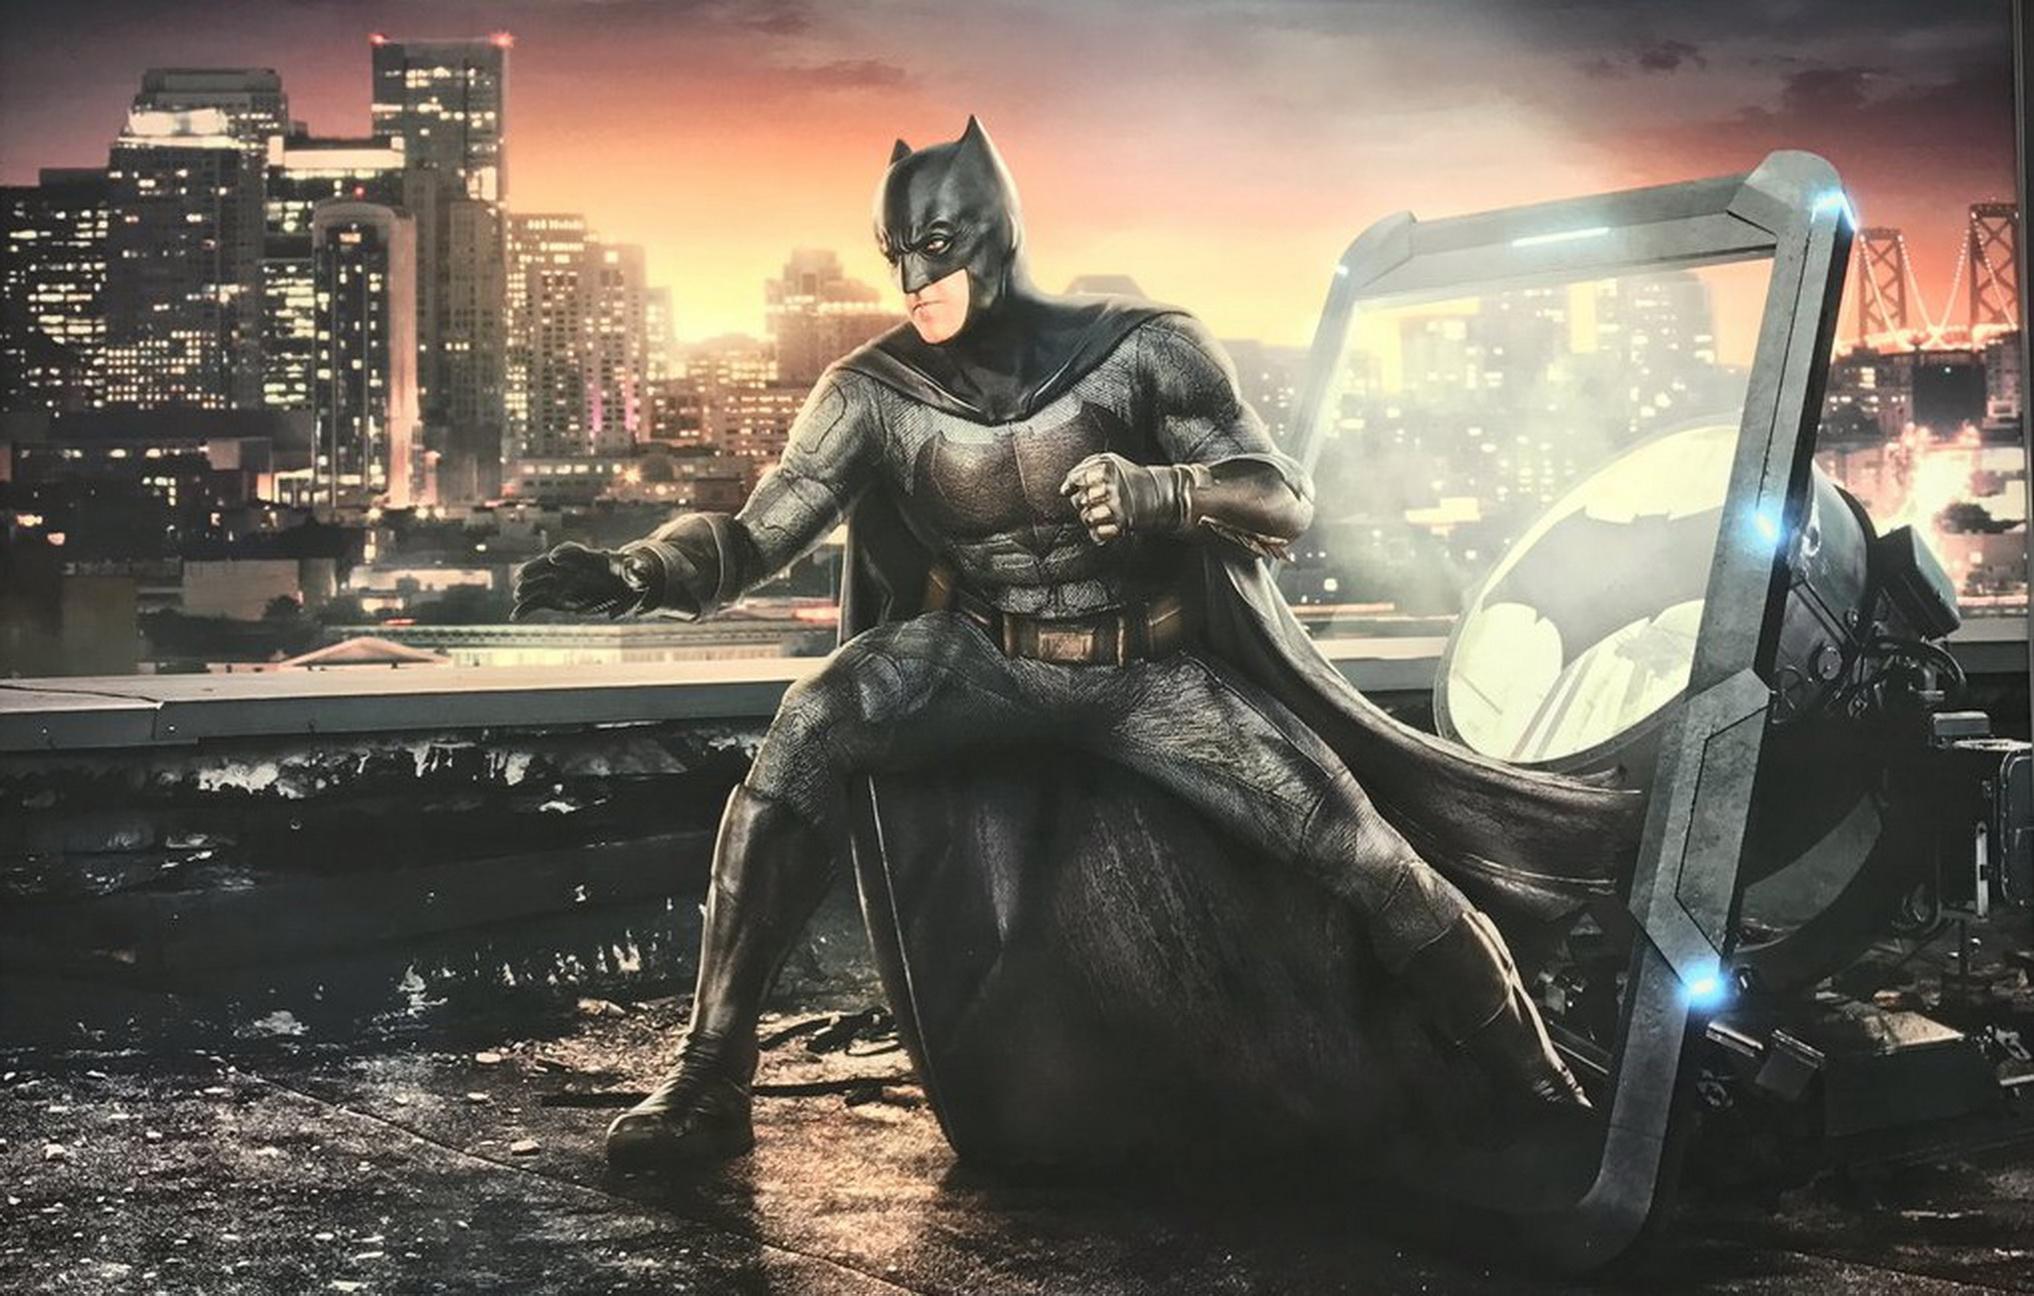 Justice League 2017 Movie 4k Hd Desktop Wallpaper For 4k: Batman Justice League 2017 Atnt, HD Movies, 4k Wallpapers